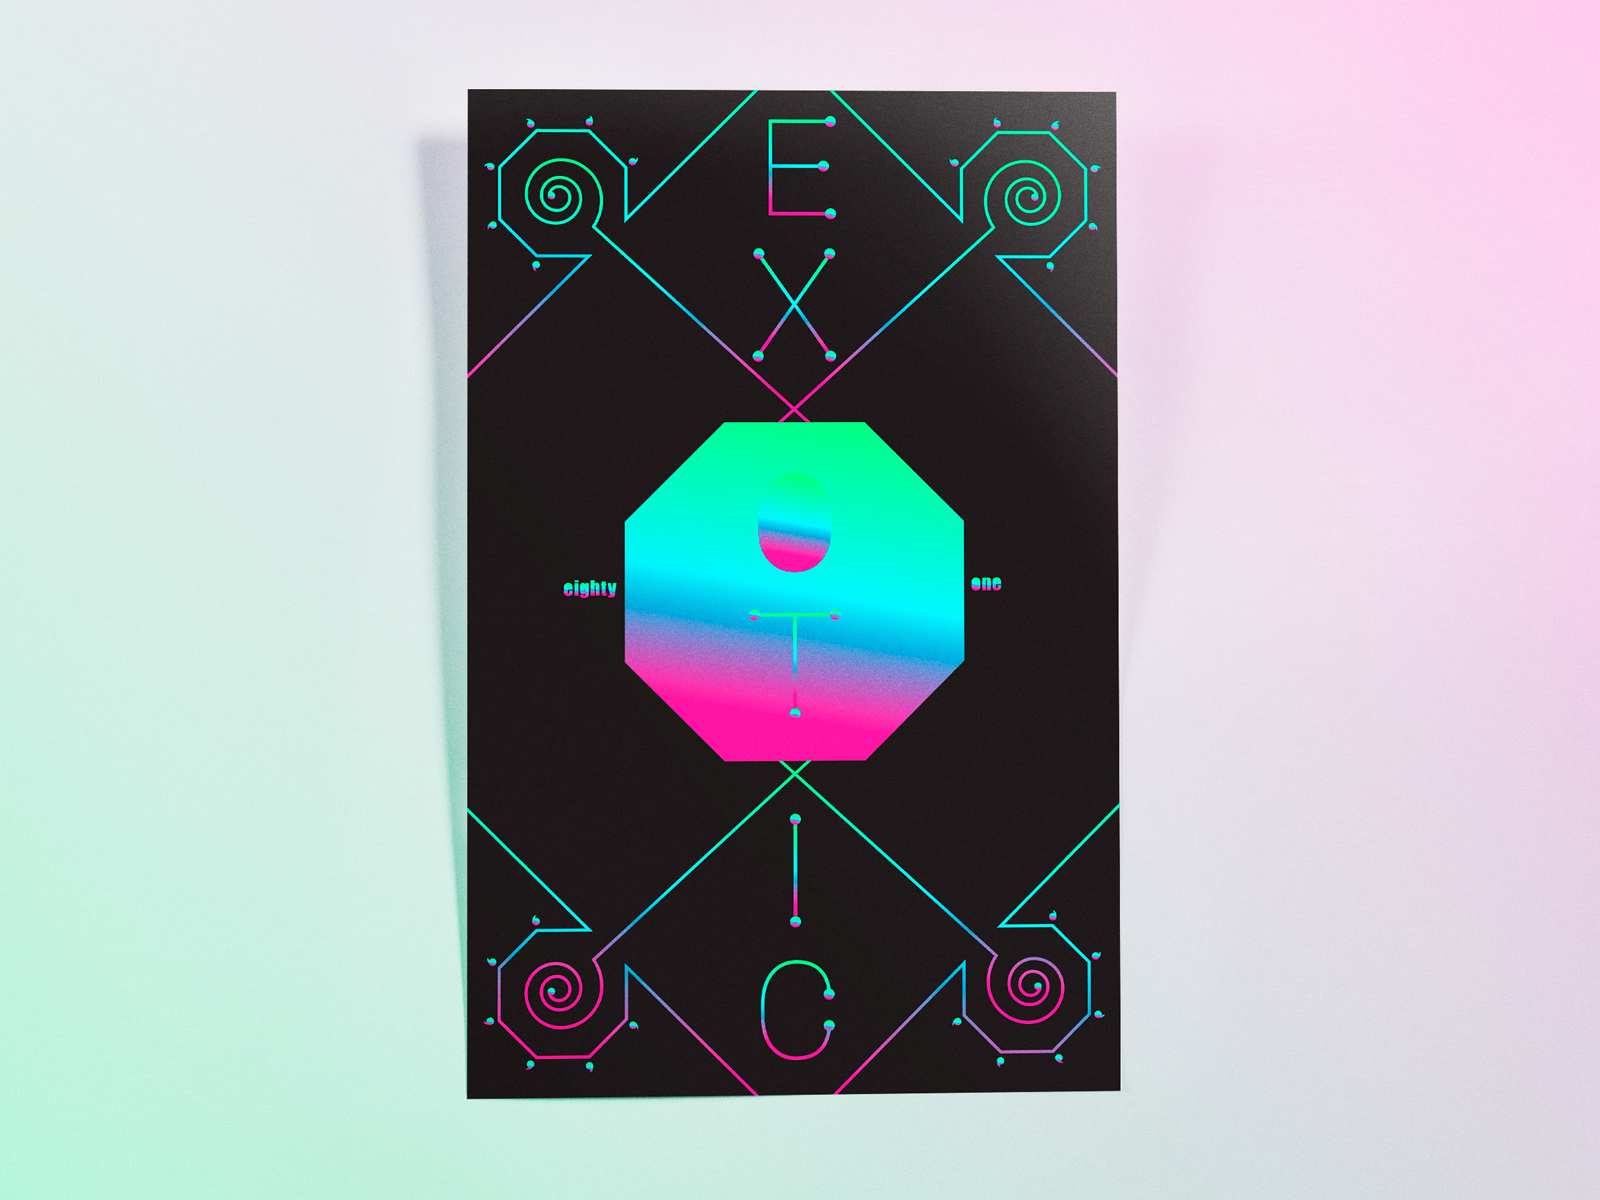 poster-4-19-19_eightyoneB-web-mockup.jpg